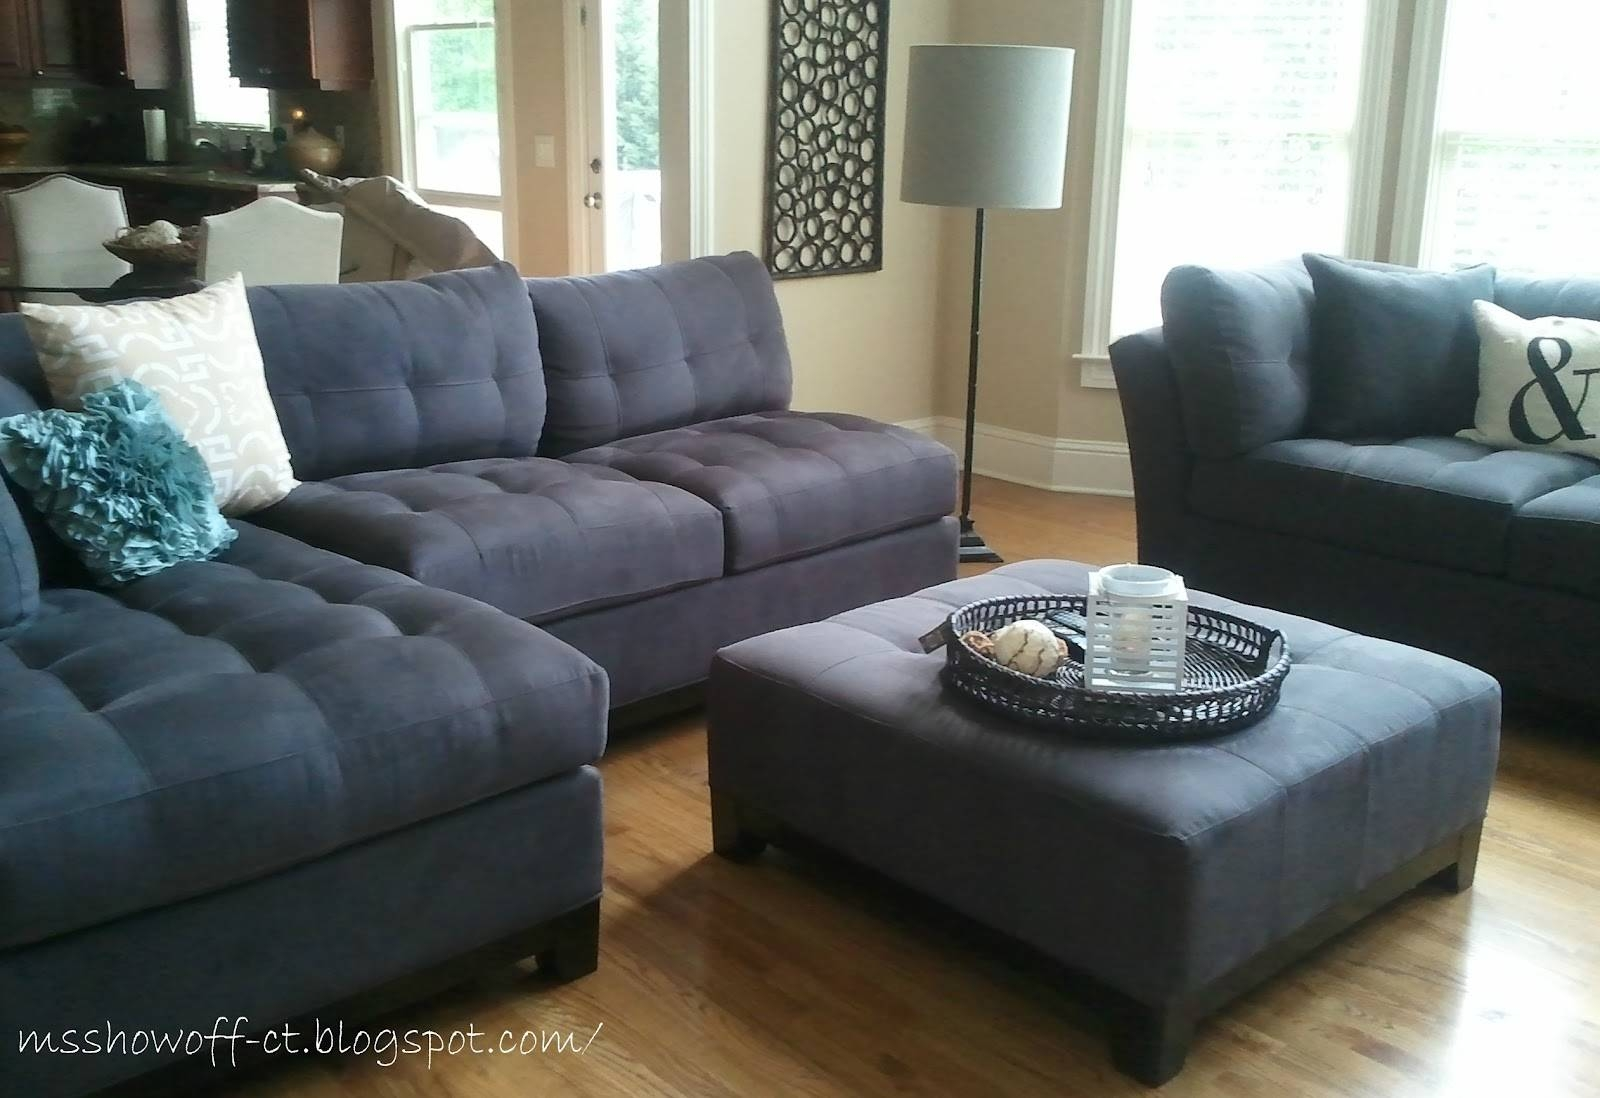 Show Off: Living Room Updates {The Room Wth 15 Windows!} Regarding Cindy Crawford Metropolis Sofas (View 12 of 15)